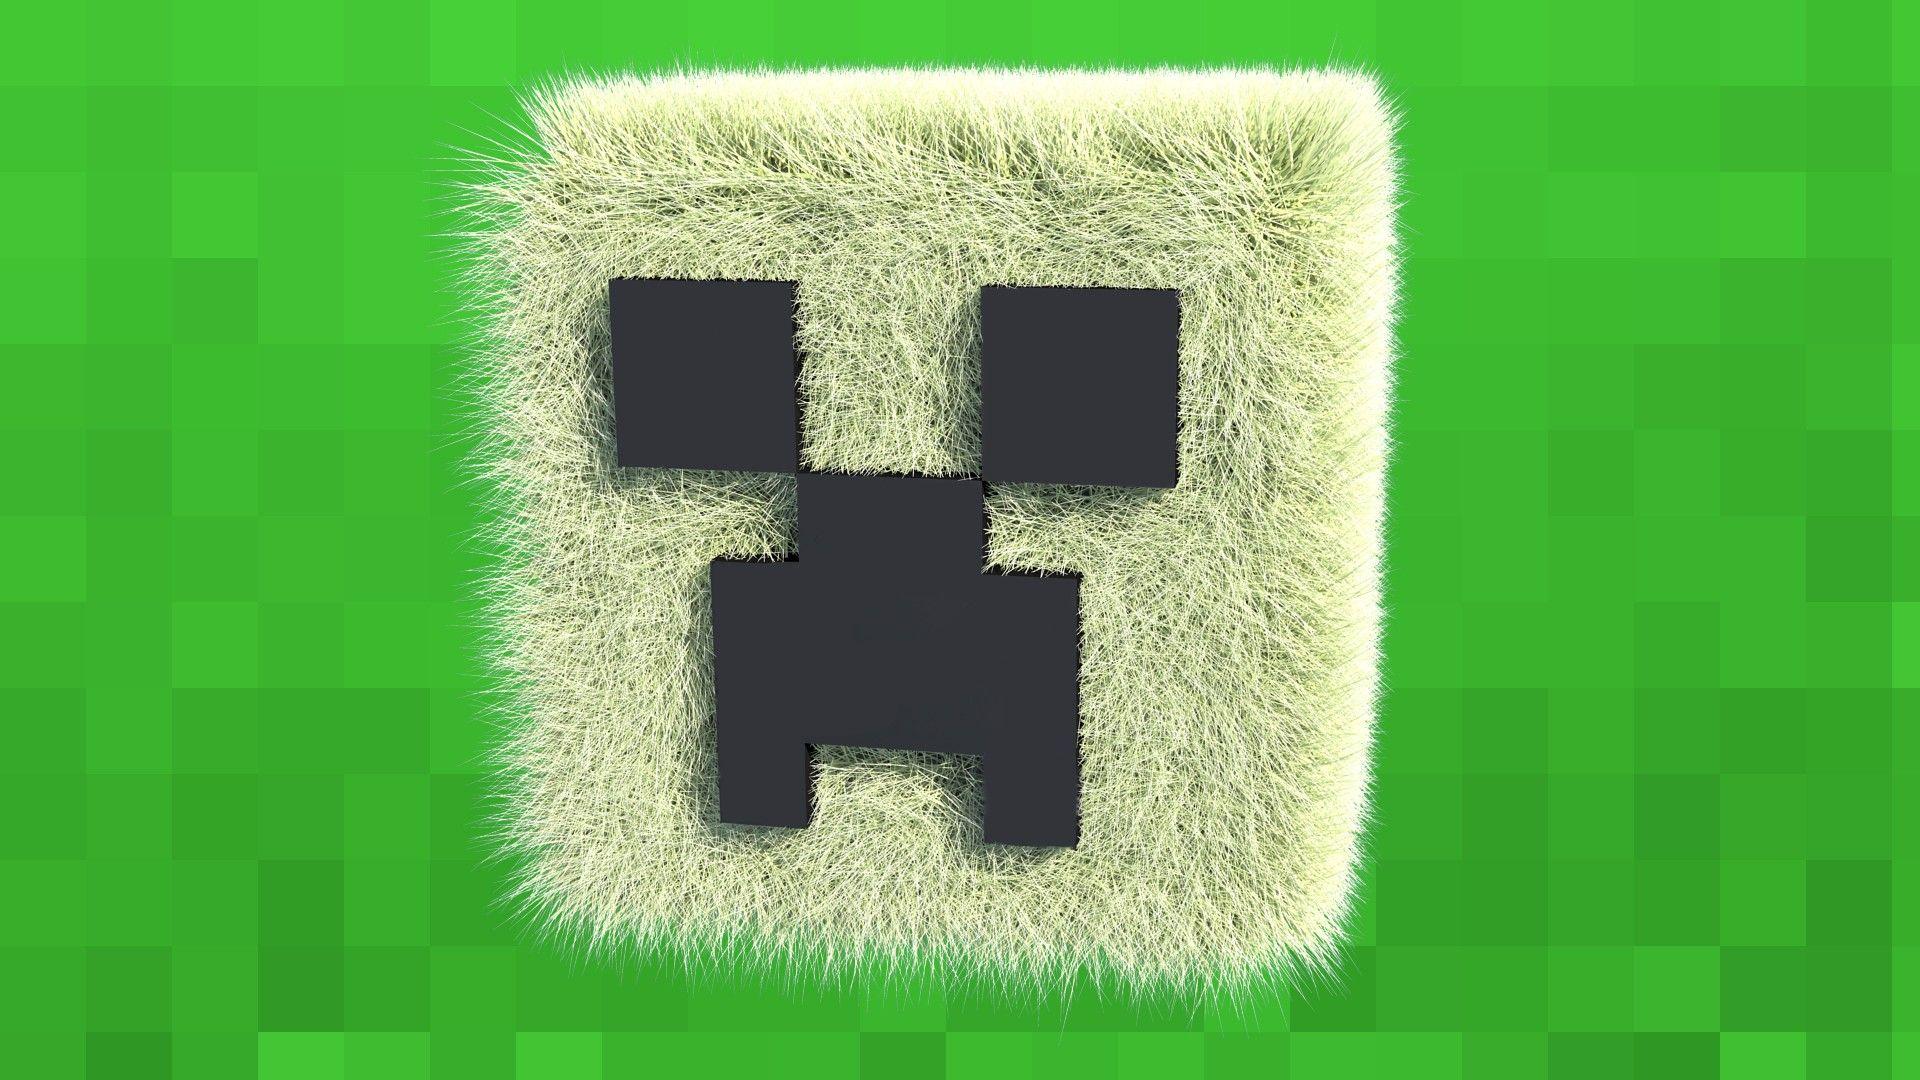 Cool Minecraft Creeper 3D Wallpapers HD Wallpaper